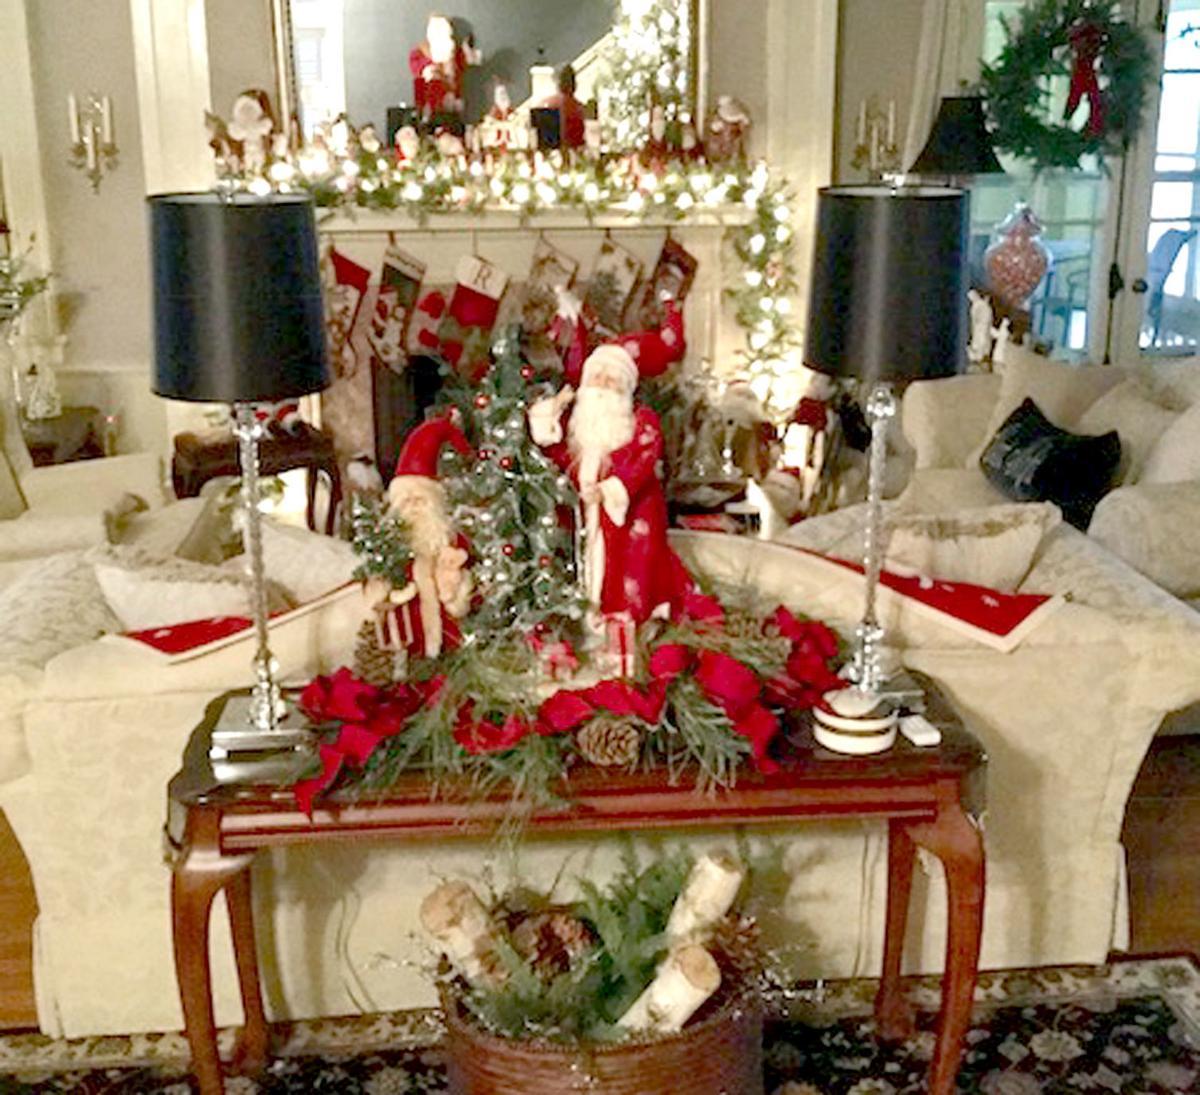 Live a Little: An old-fashioned Christmas | Josephine | newspressnow.com